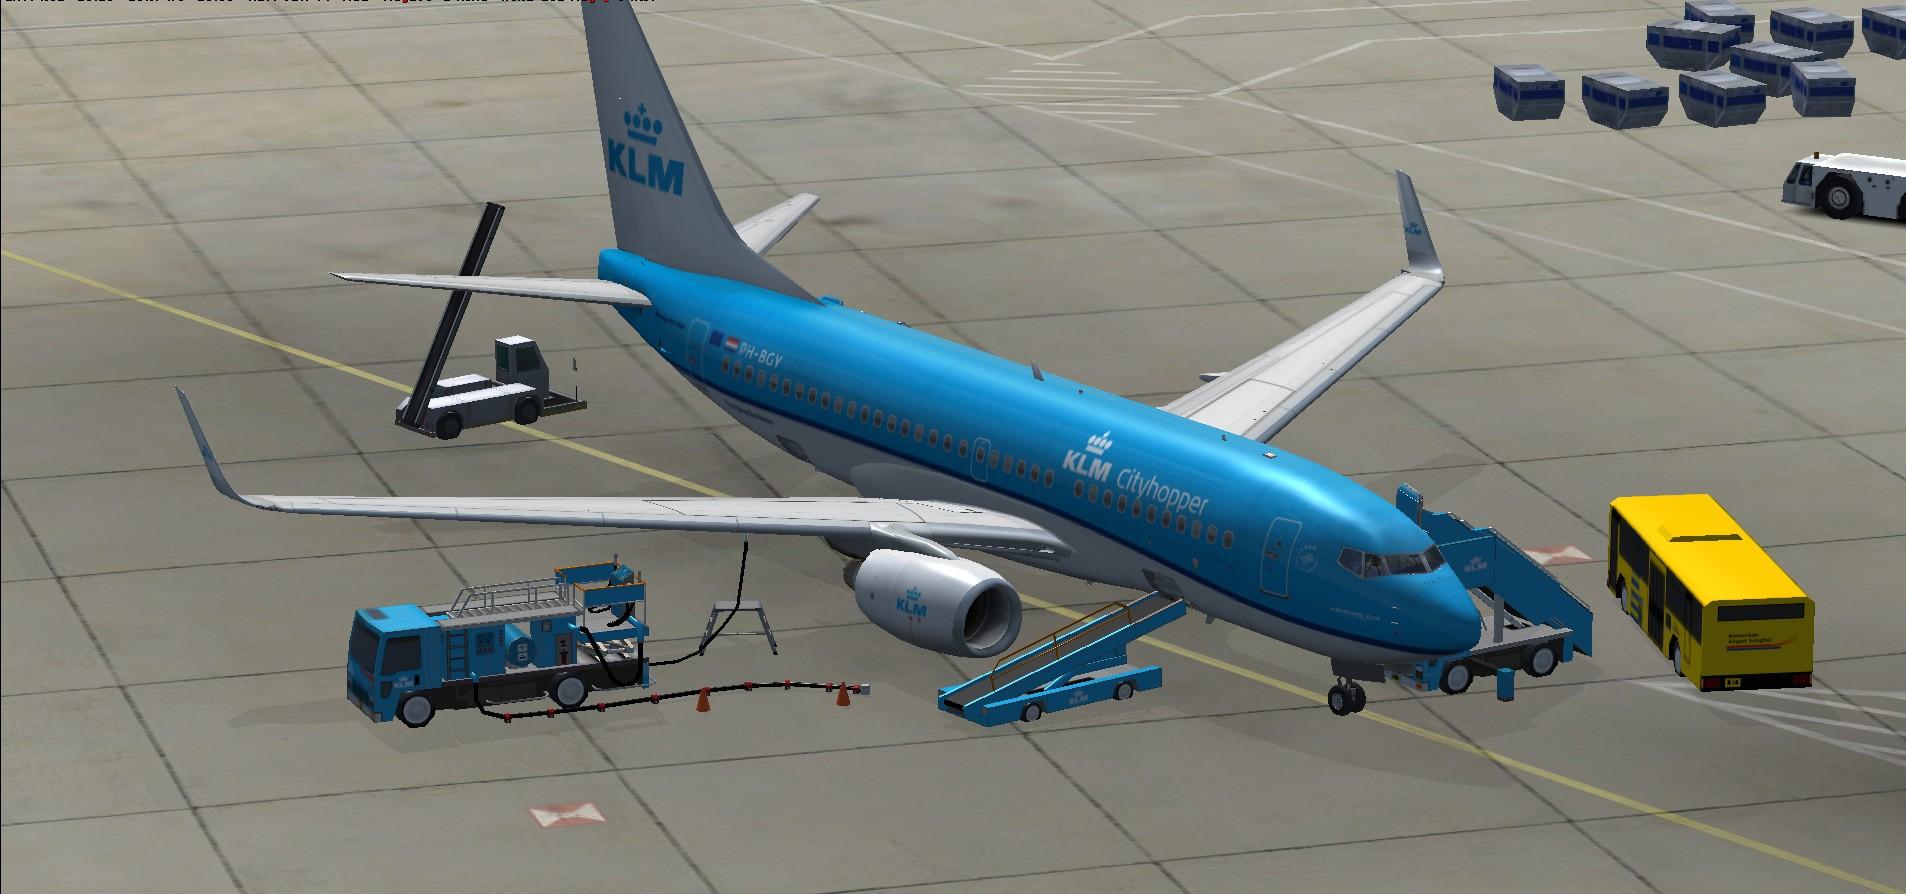 Fsx Boeing 737 700 Lufthansa Package With Vc – Fondos de Pantalla